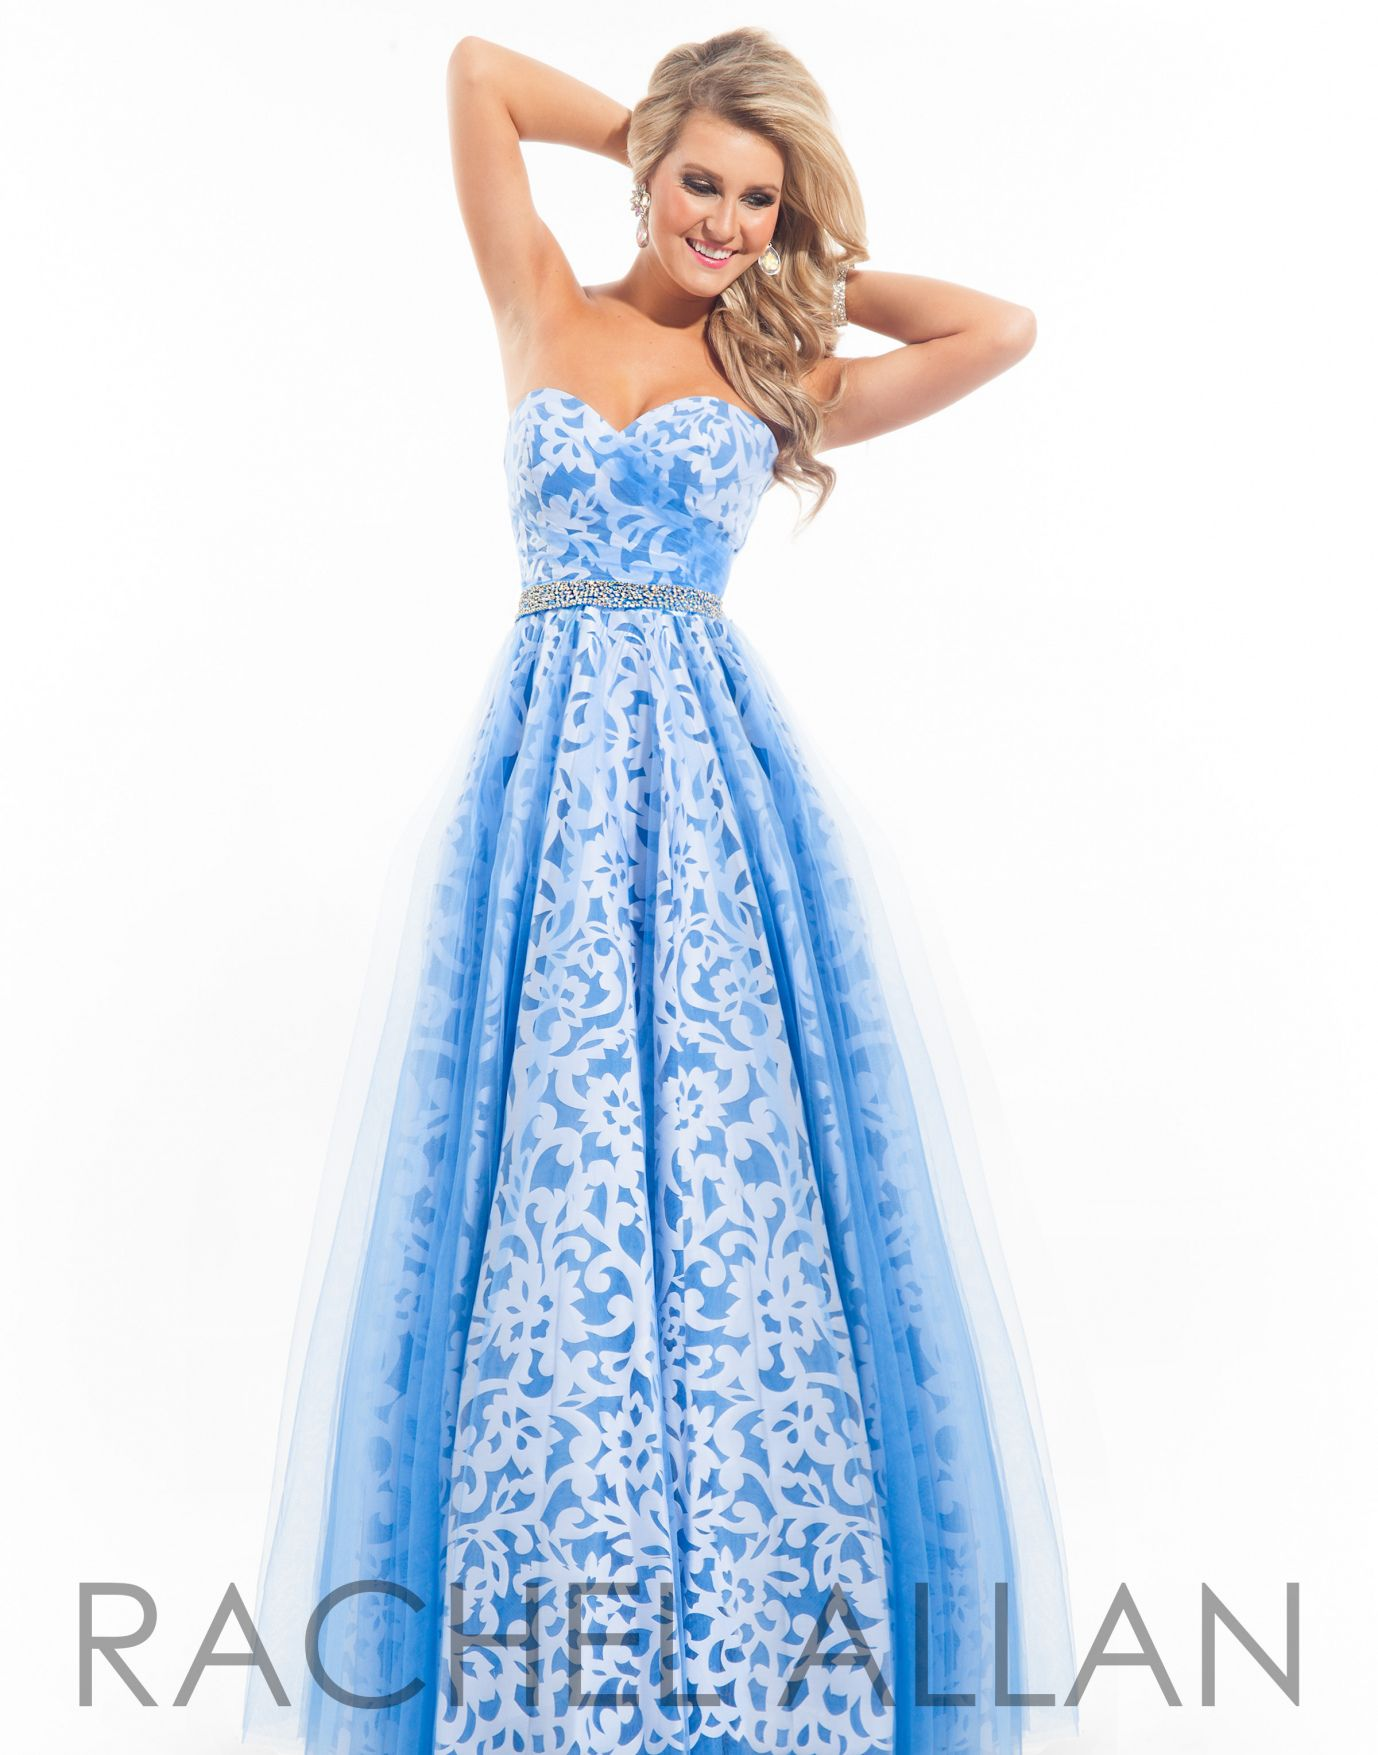 70+ Wedding Dresses In Nashville Tn - Plus Size Dresses for Wedding ...